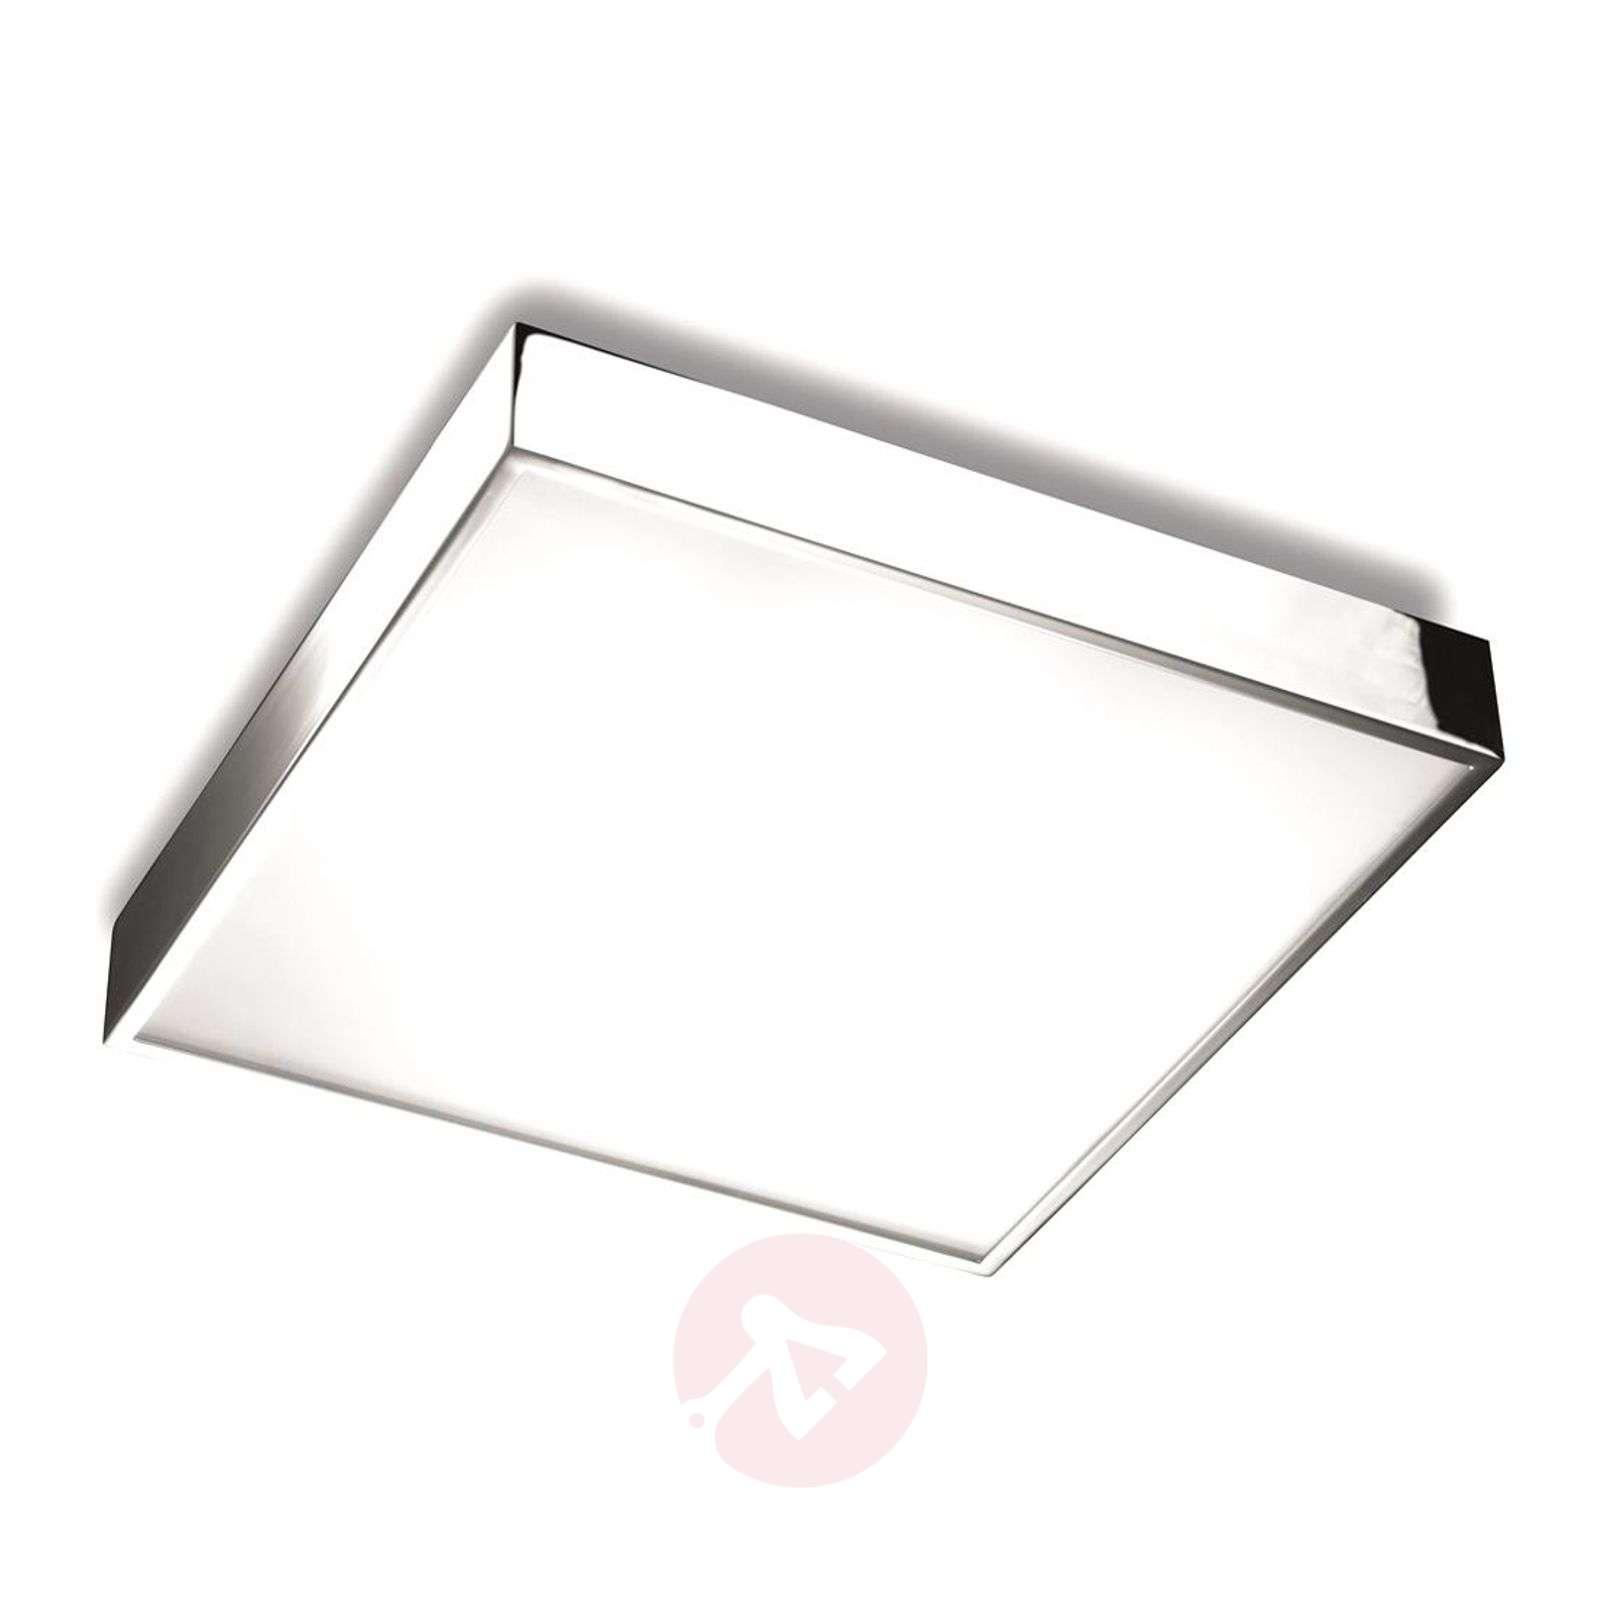 Sierstrip Chroom Badkamer : Square led ceiling lamp apolo ip20 lights.ie